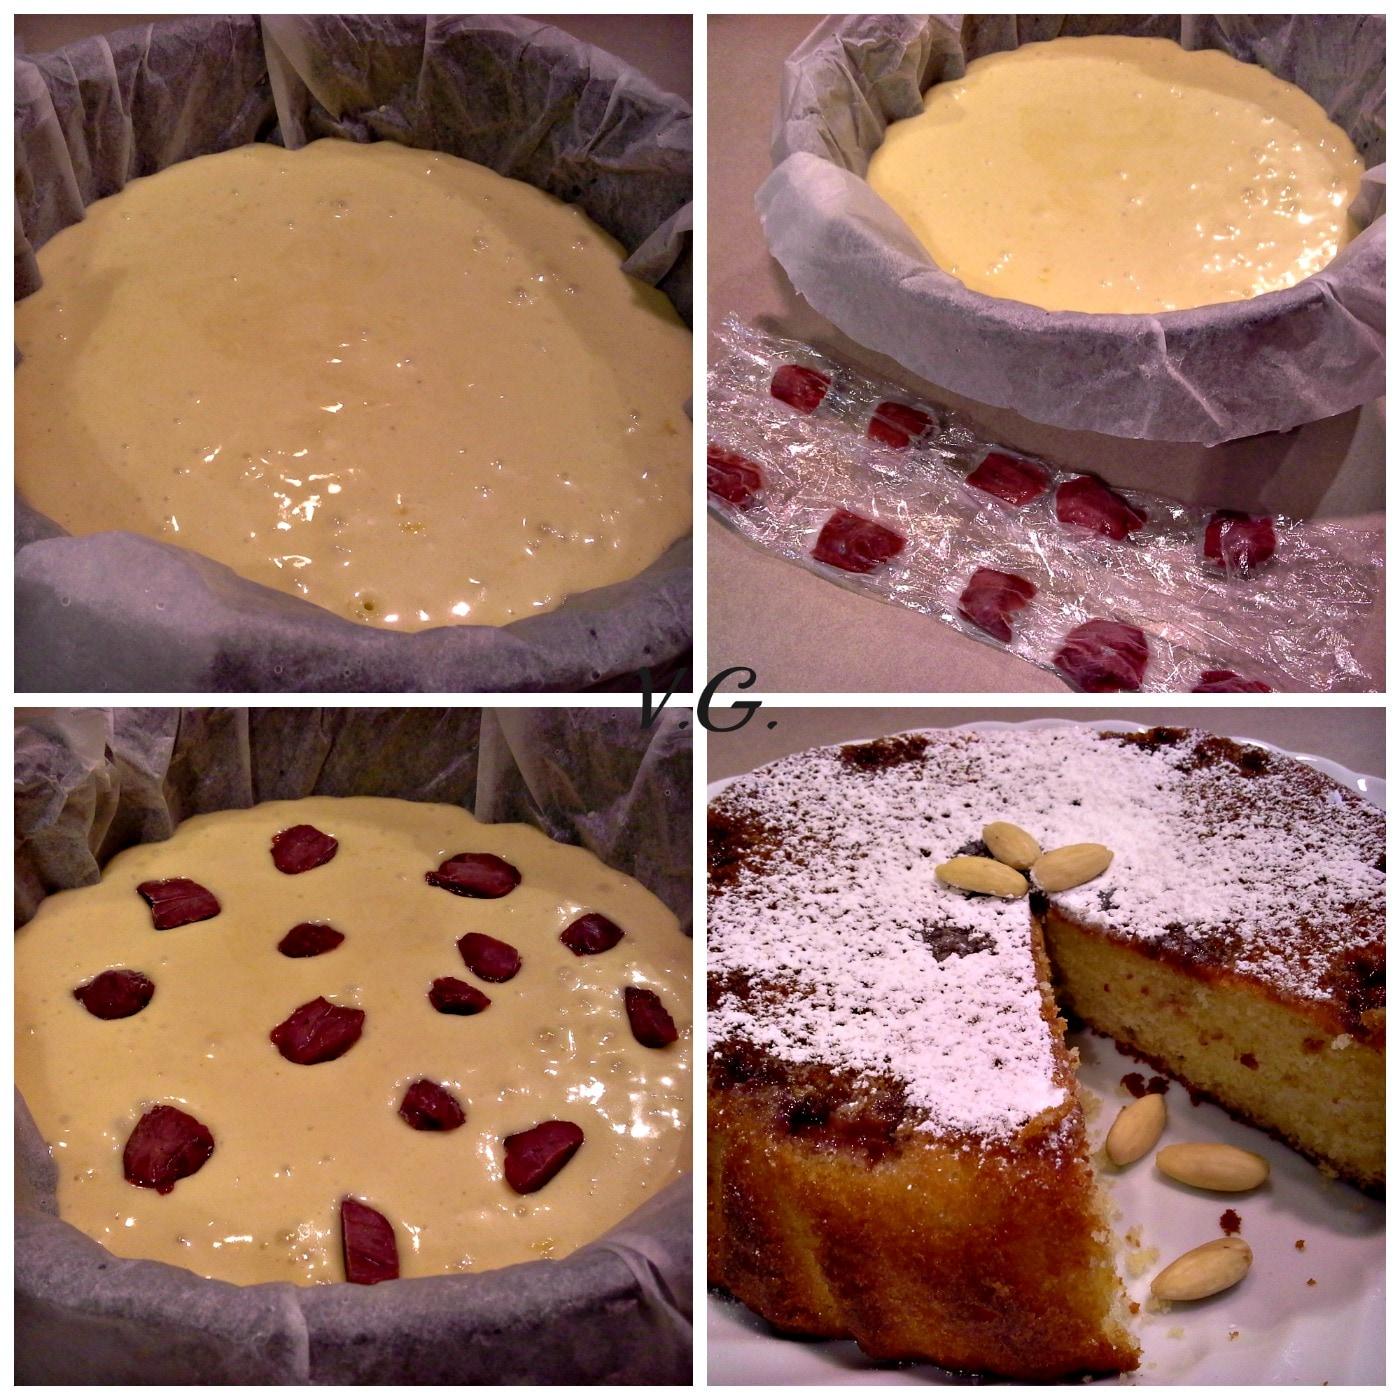 torta yogurt limone mandorle collage 2-2